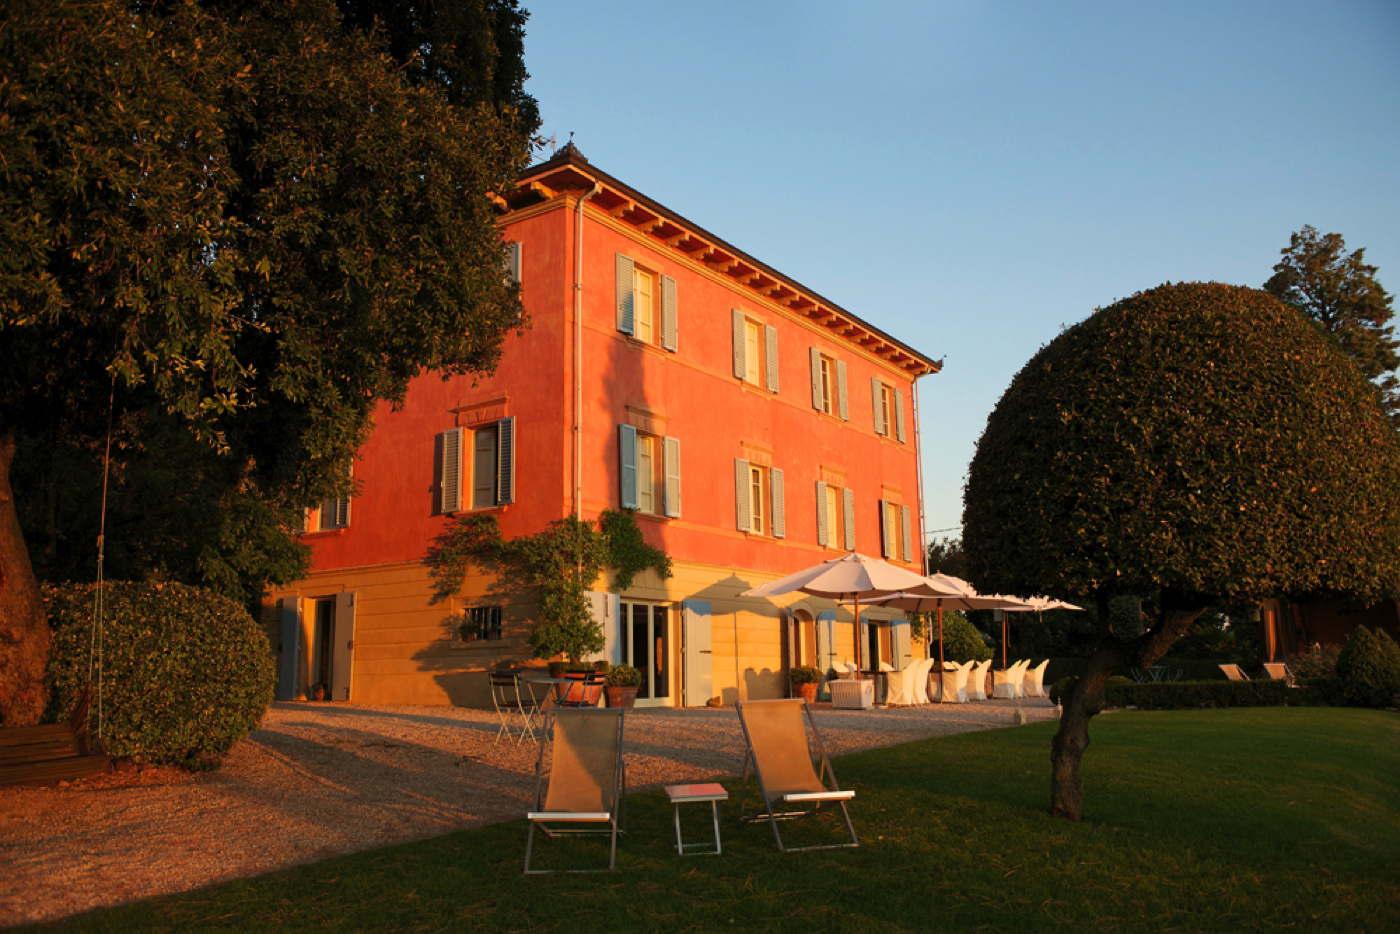 Luxusvilla in italien villa toskana mieten designhotel for Designhotel italien